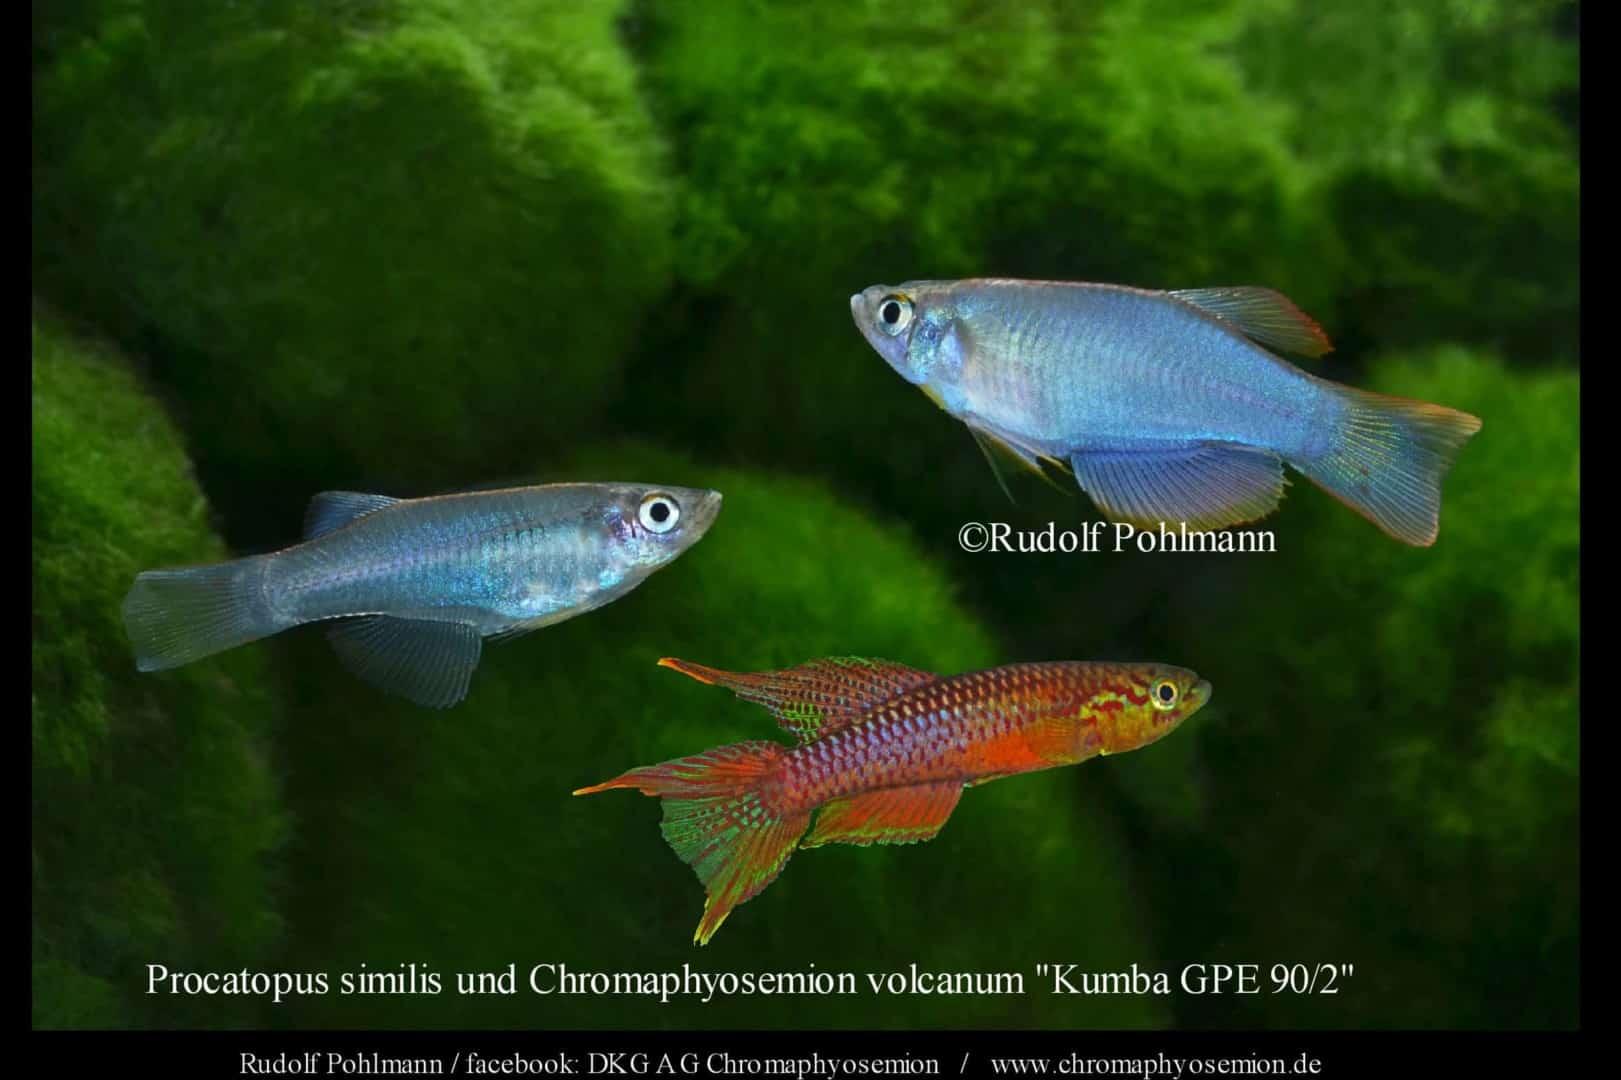 Procatopus similis – Similis breitflössiger Leuchtaugen 1